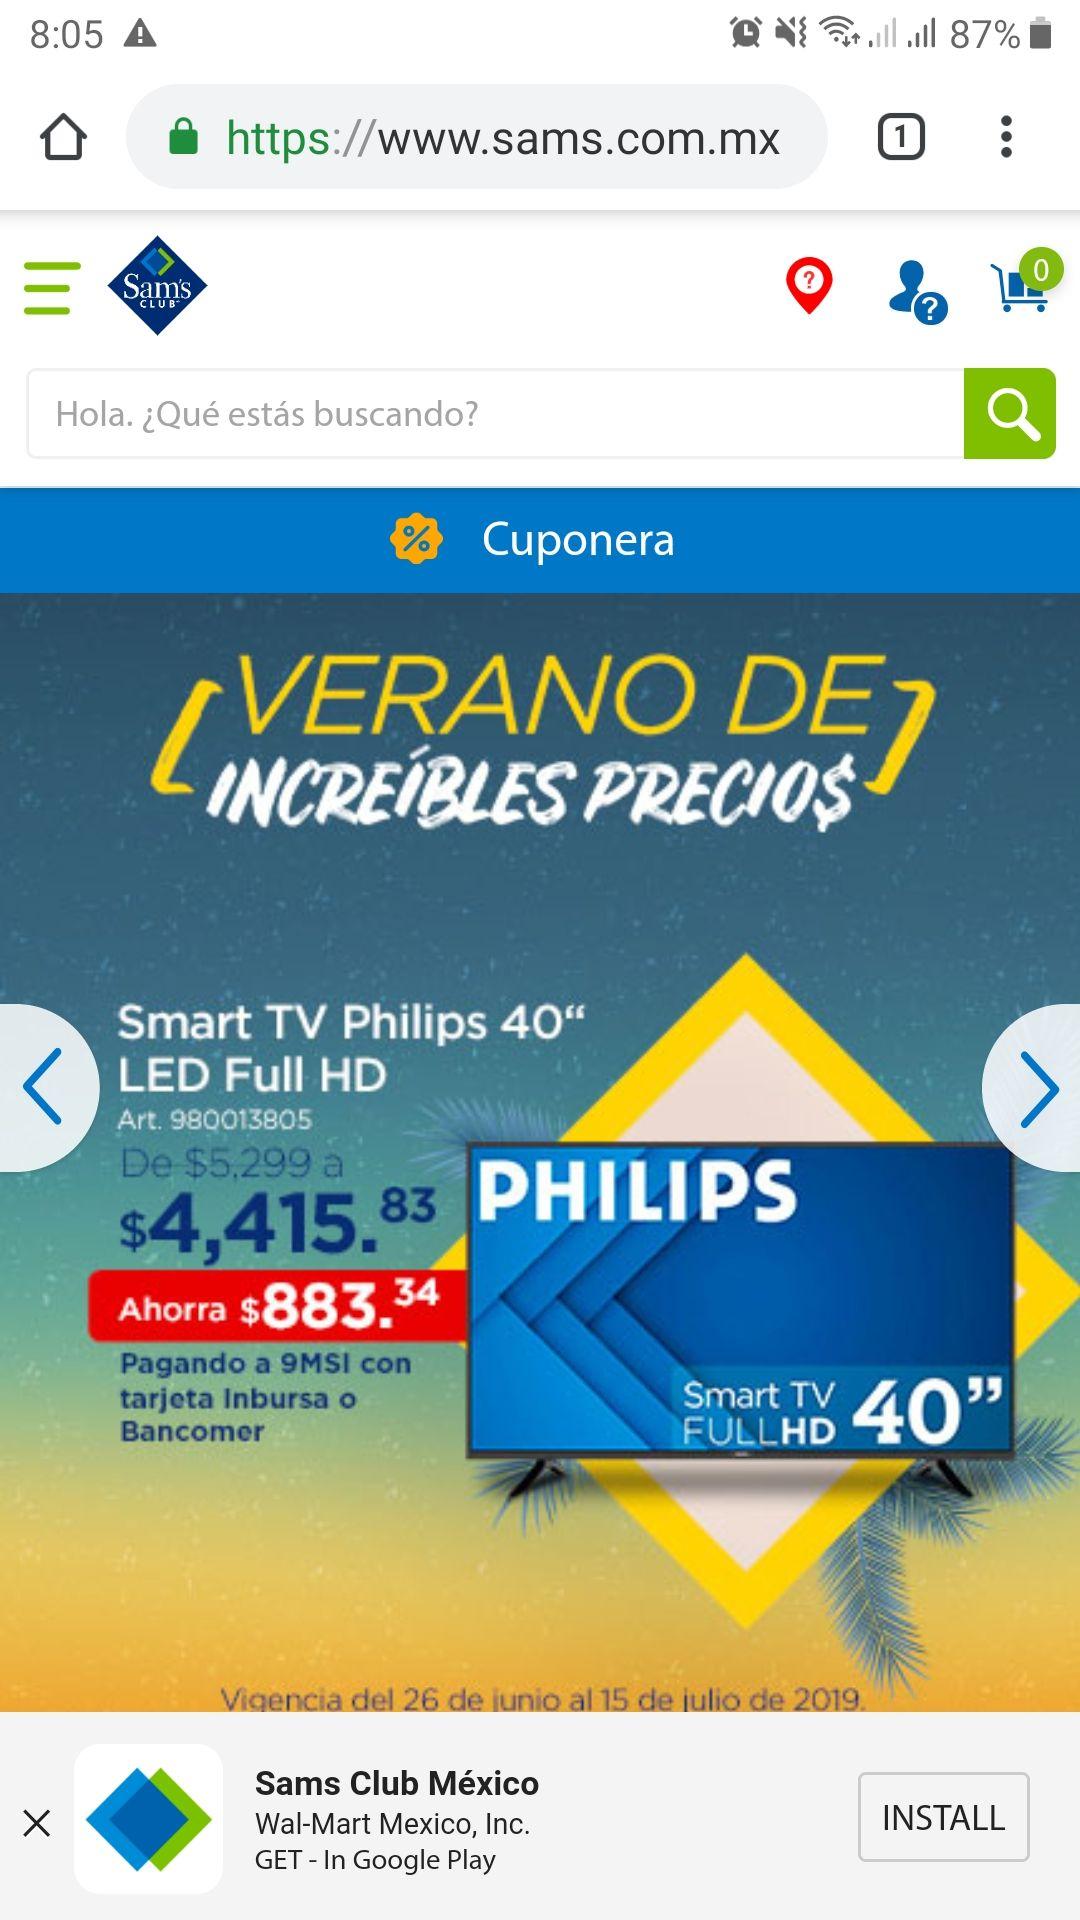 "Sam's Club: Smart TV Philips 40"" (pagando con Inbursa o BBVA)"